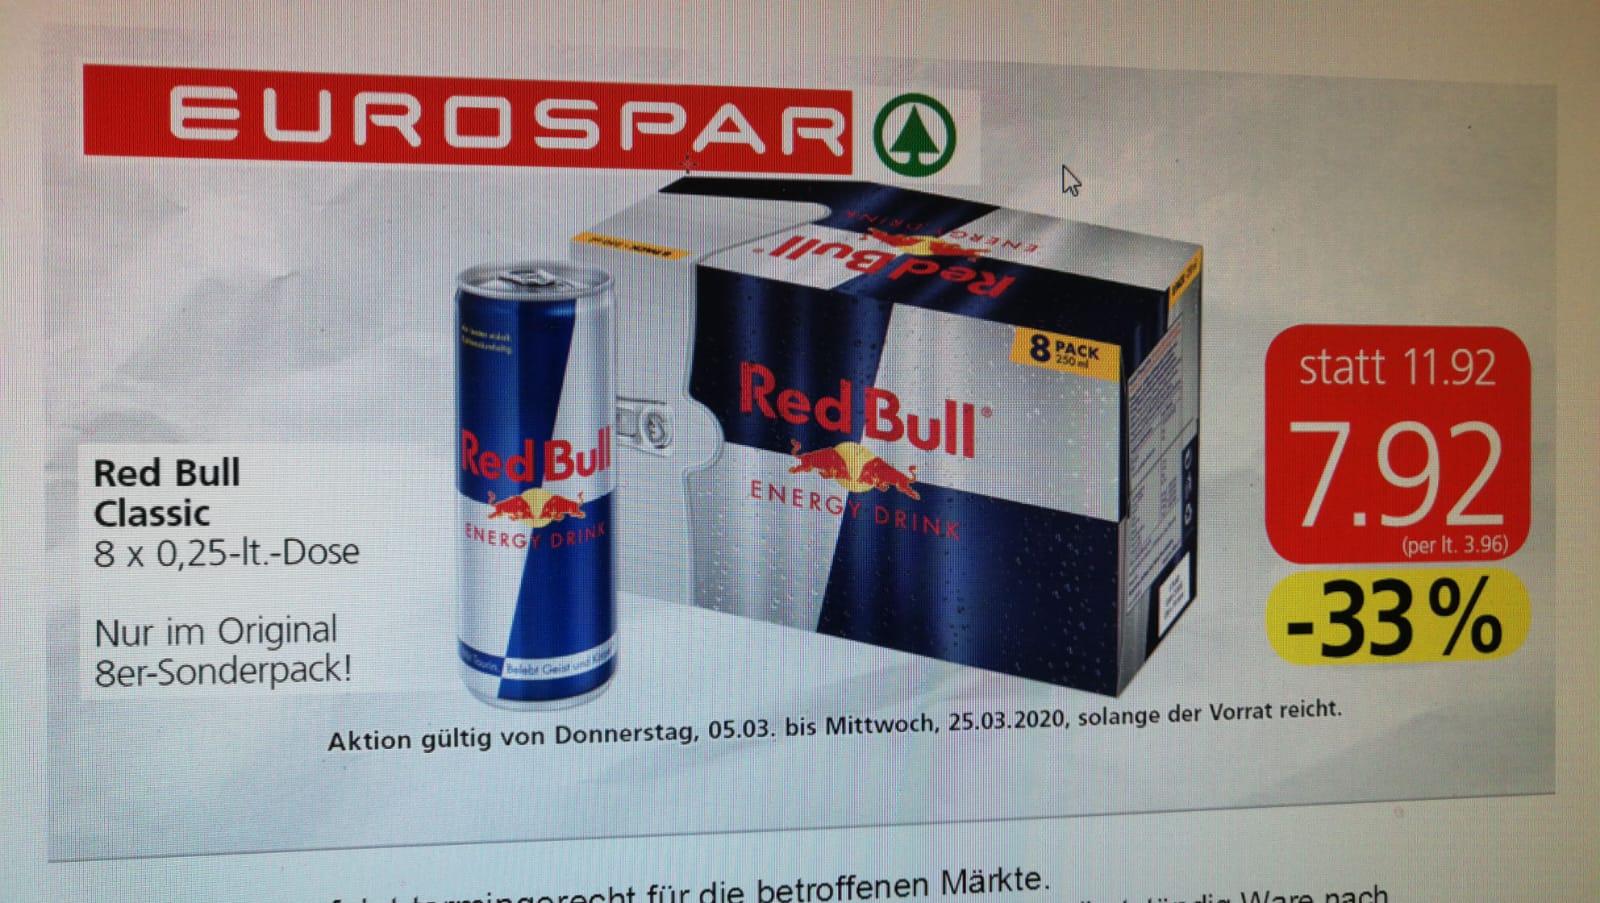 [Ankündigung] Eurospar Red Bull 8 x 250ml